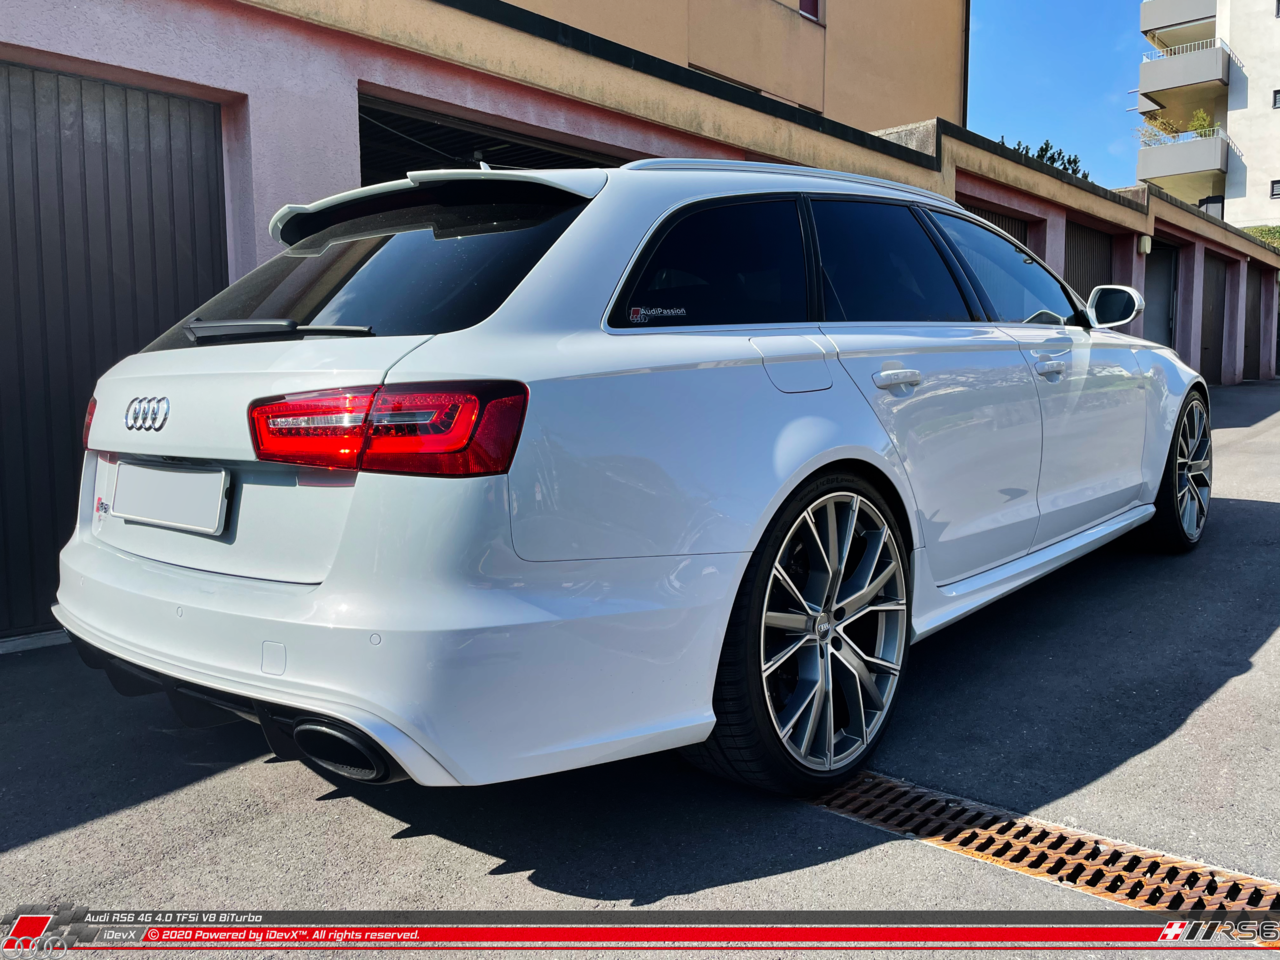 03.04.2021_Audi-RS6_iDevX_003.png